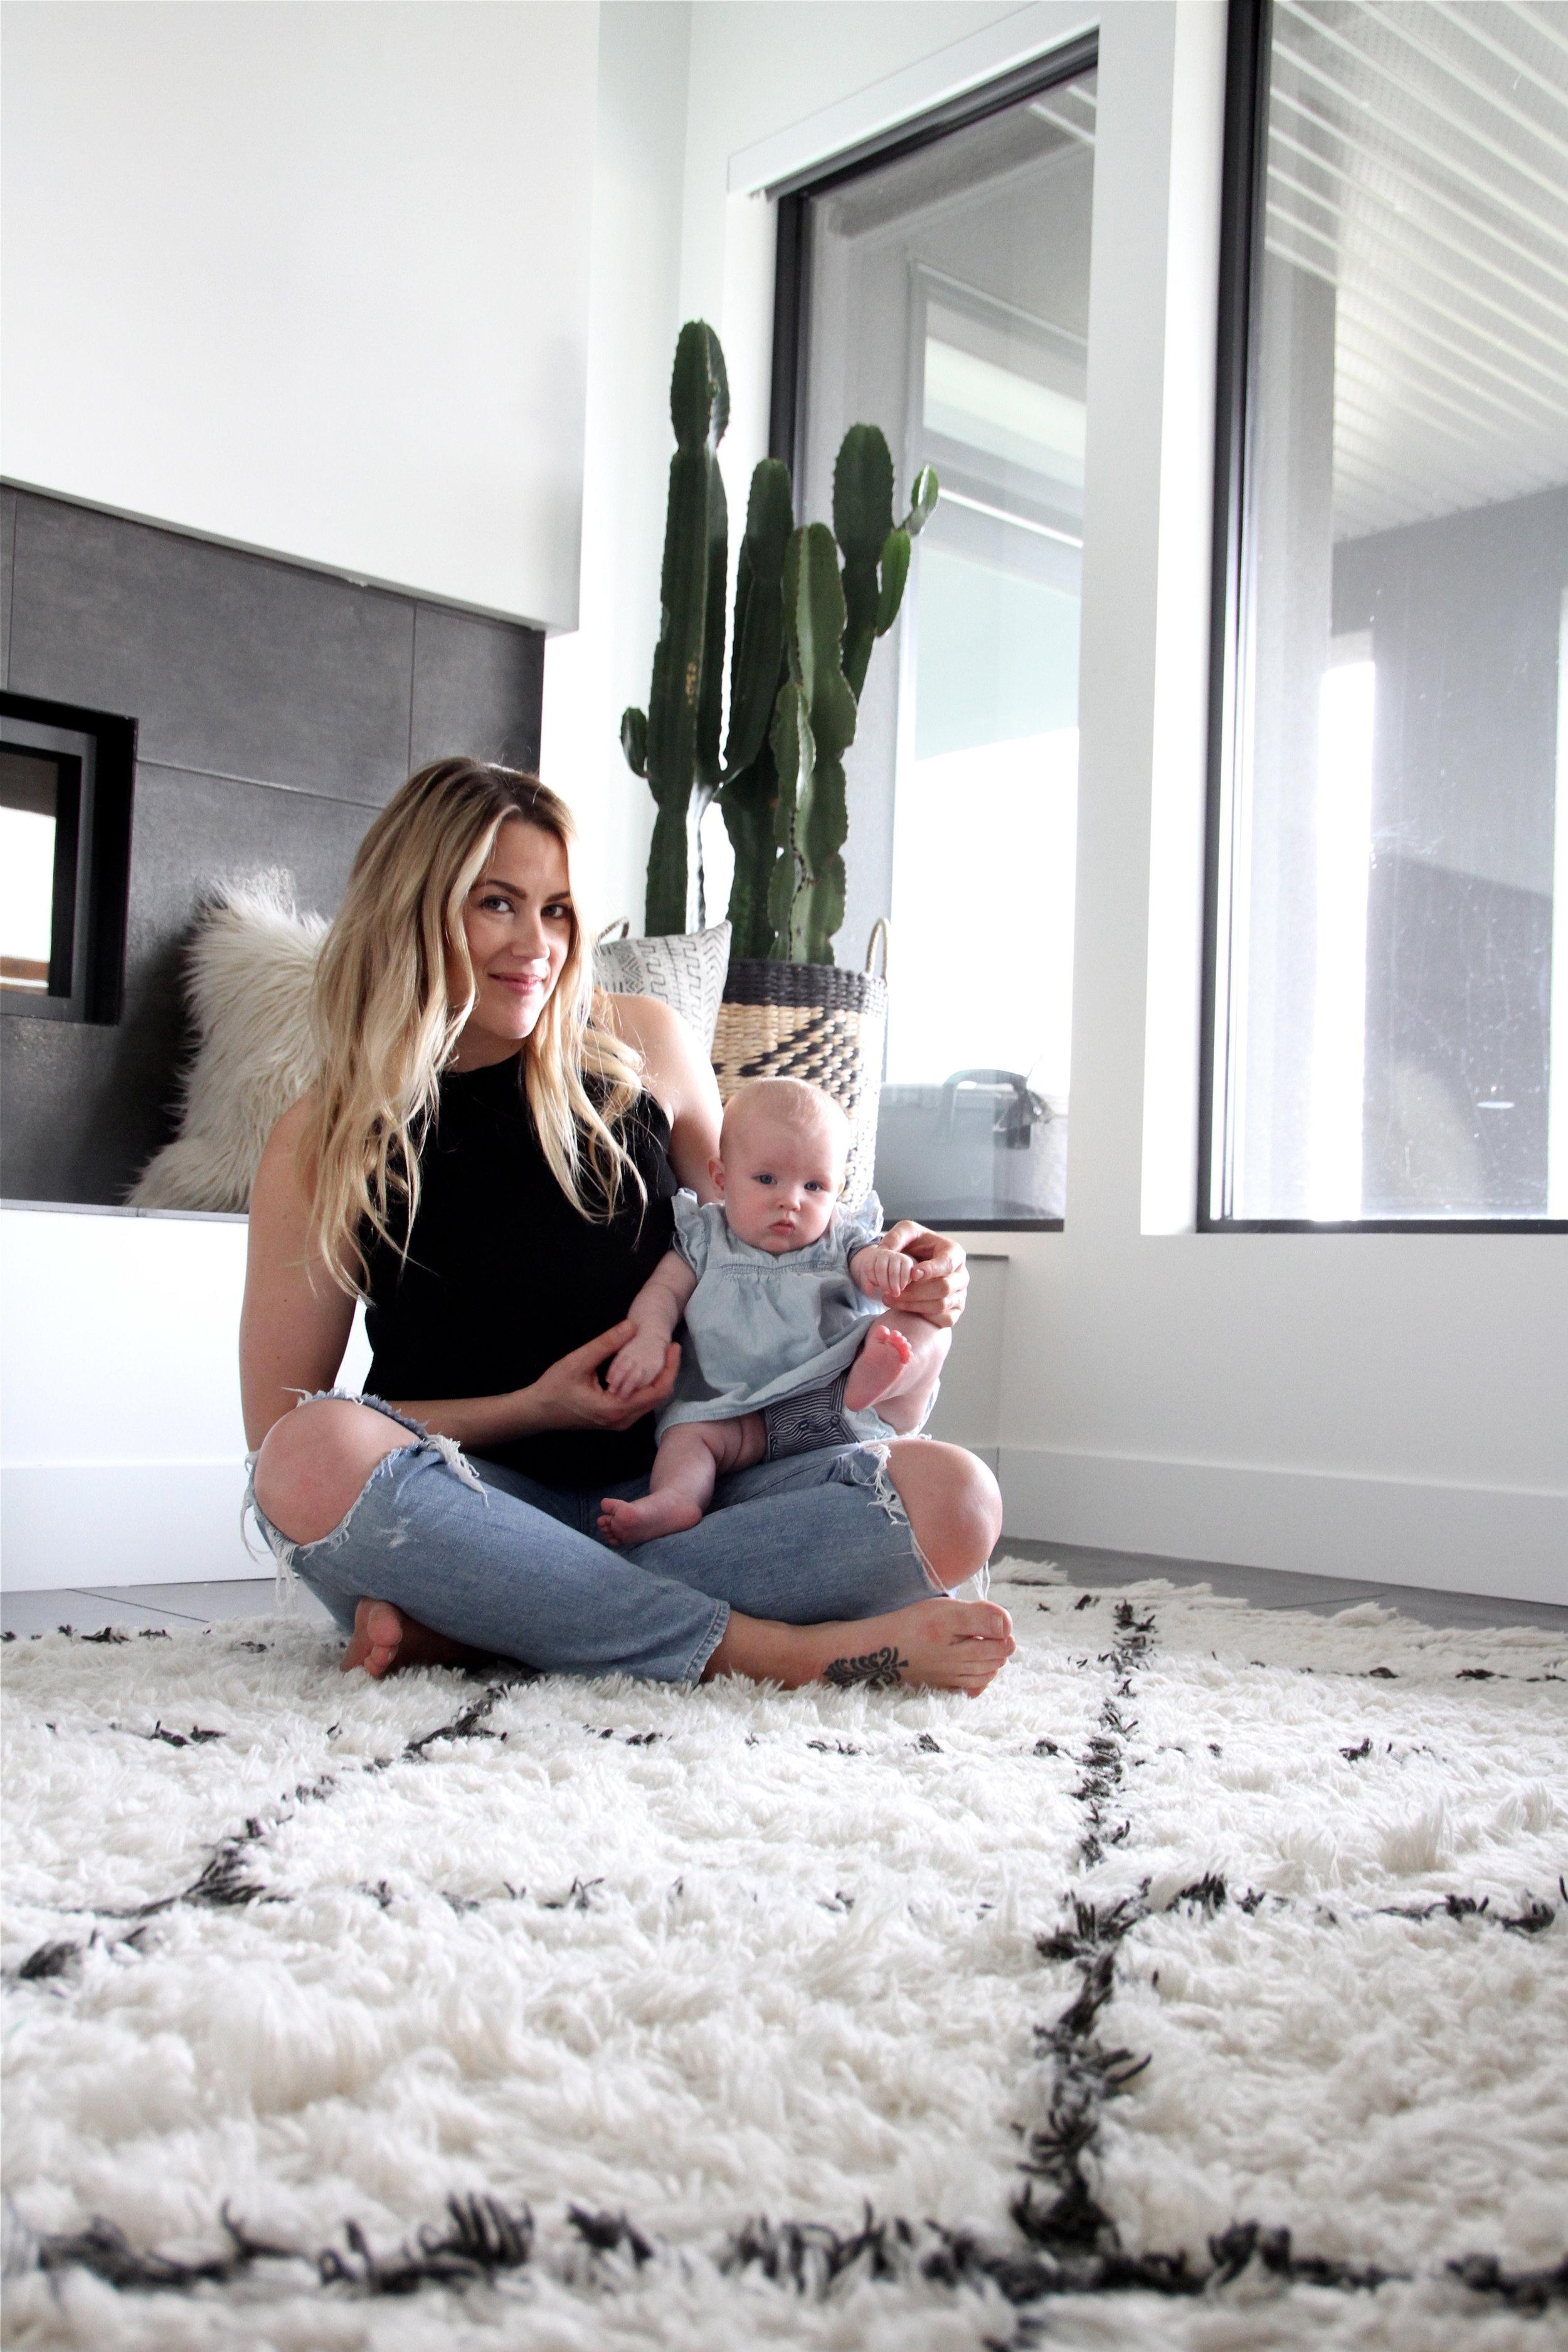 Baby & Body: 4 Month Update